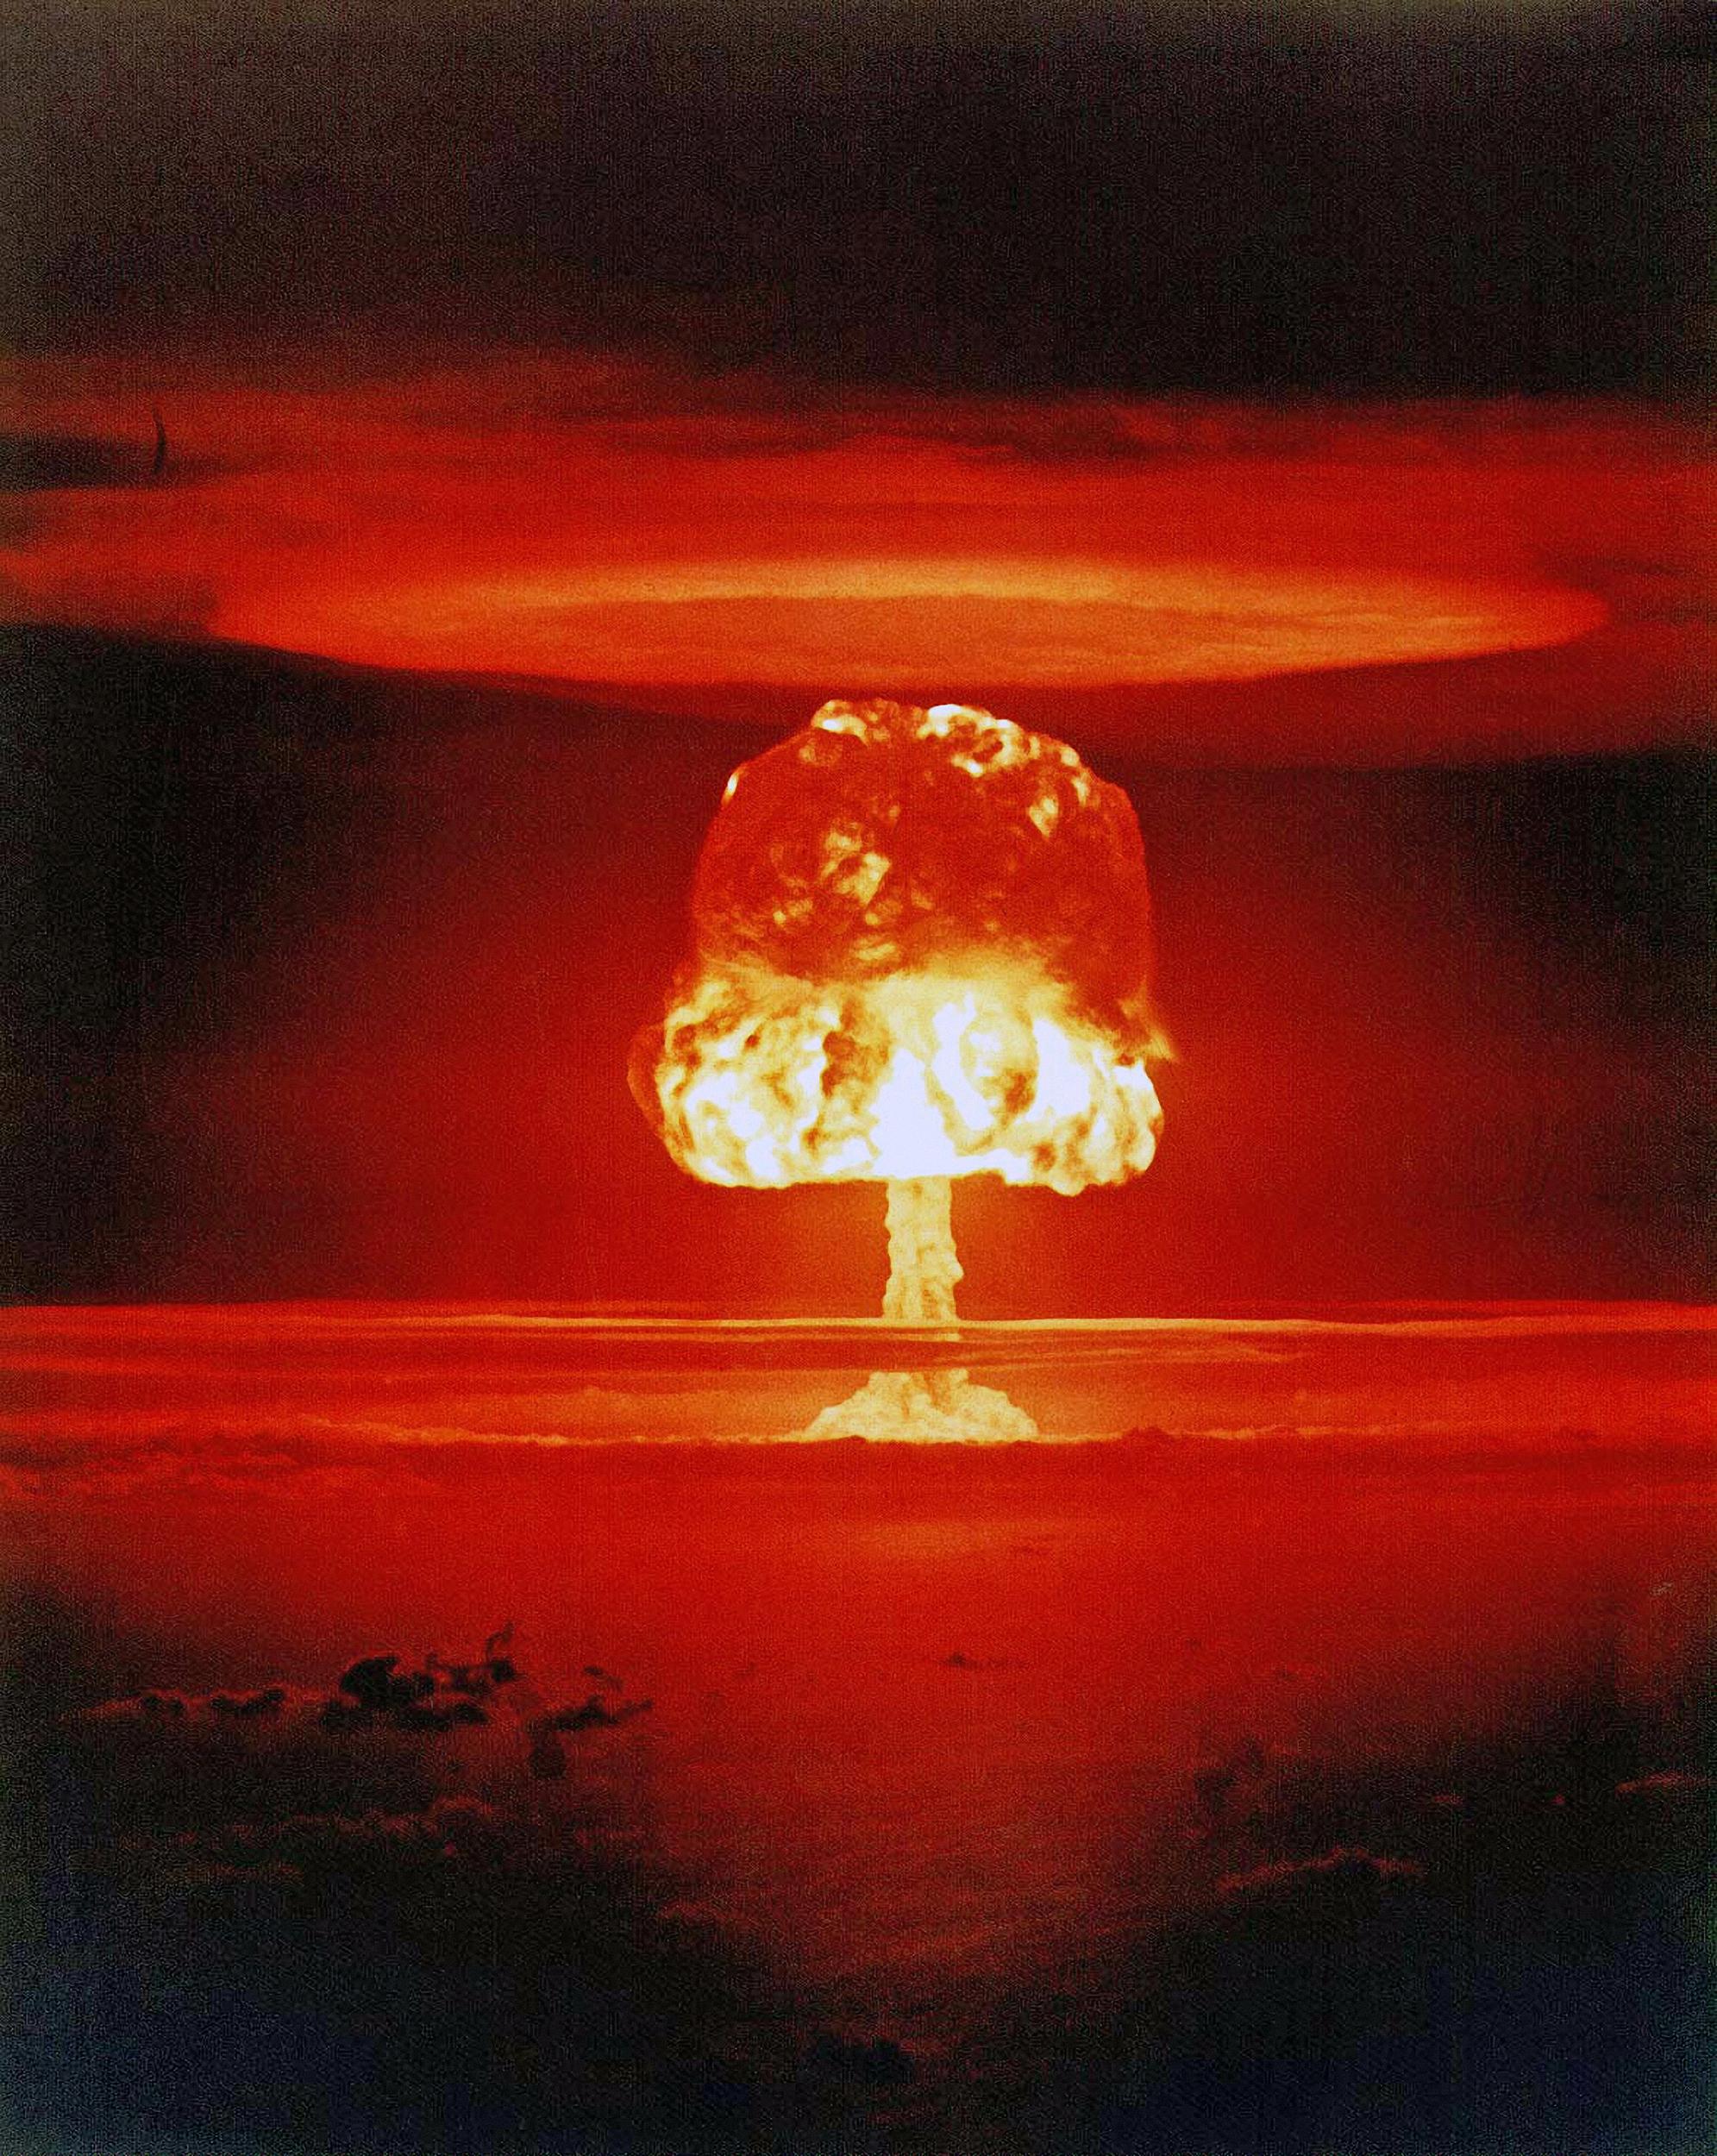 Image: Nuclear Test USA - Mark 14